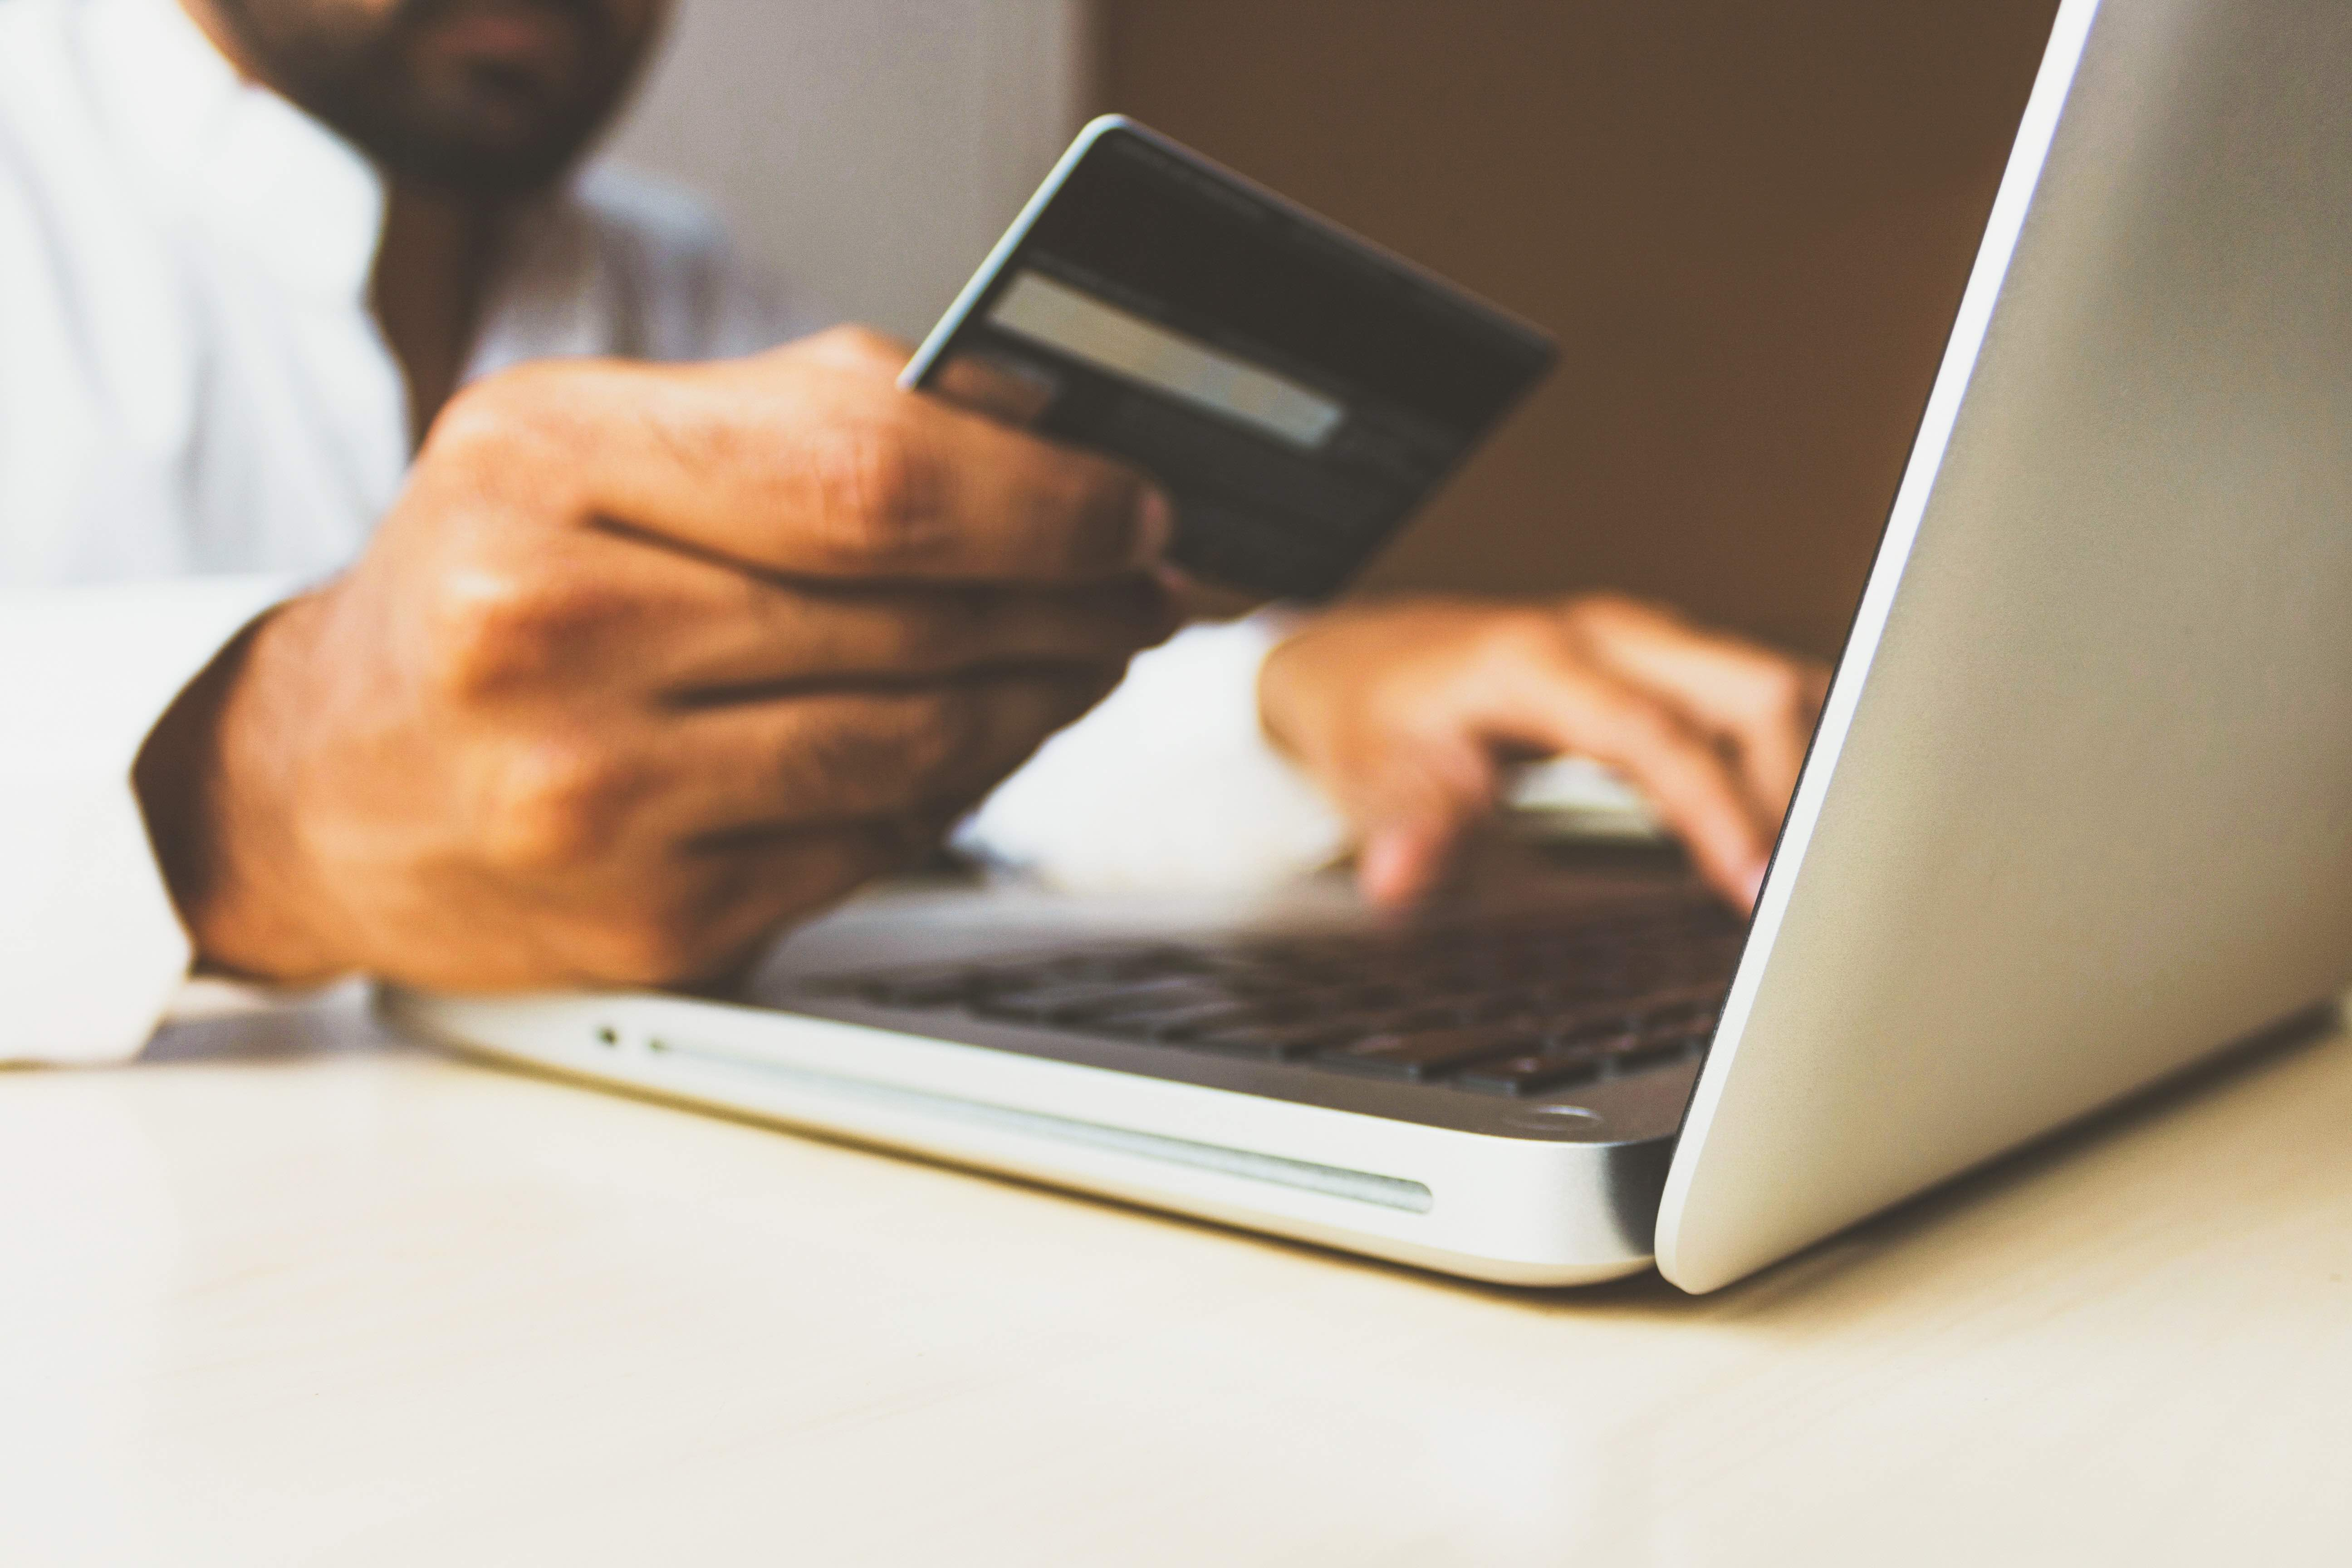 black friday ecommerce cyber monday 2020 tips